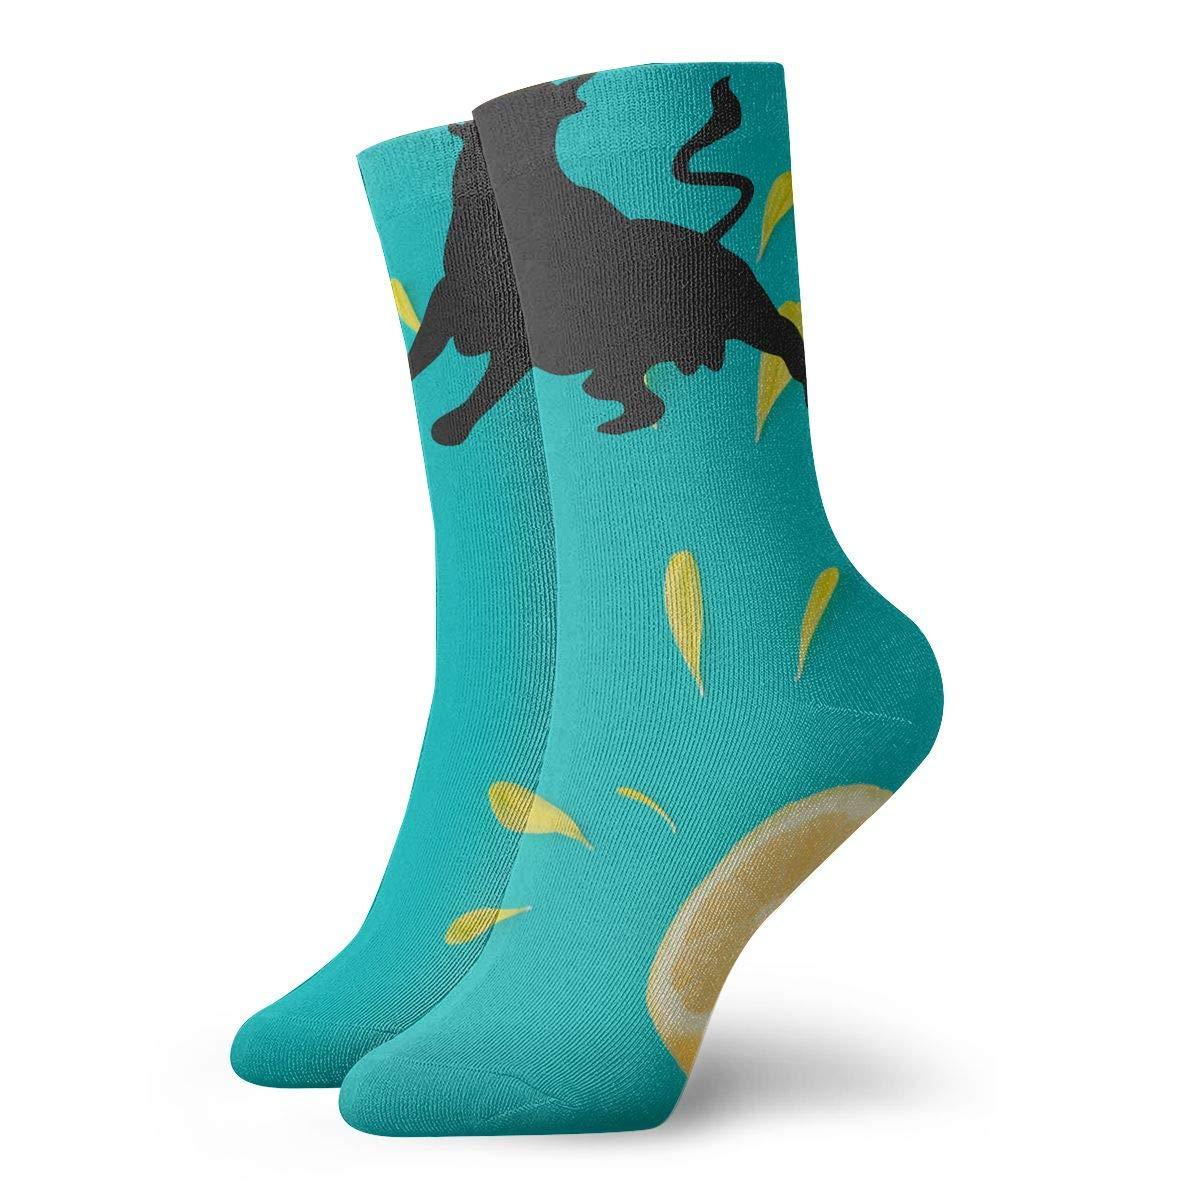 Bull Fighting Fashion Dress Socks Short Socks Leisure Travel 11.8 Inch